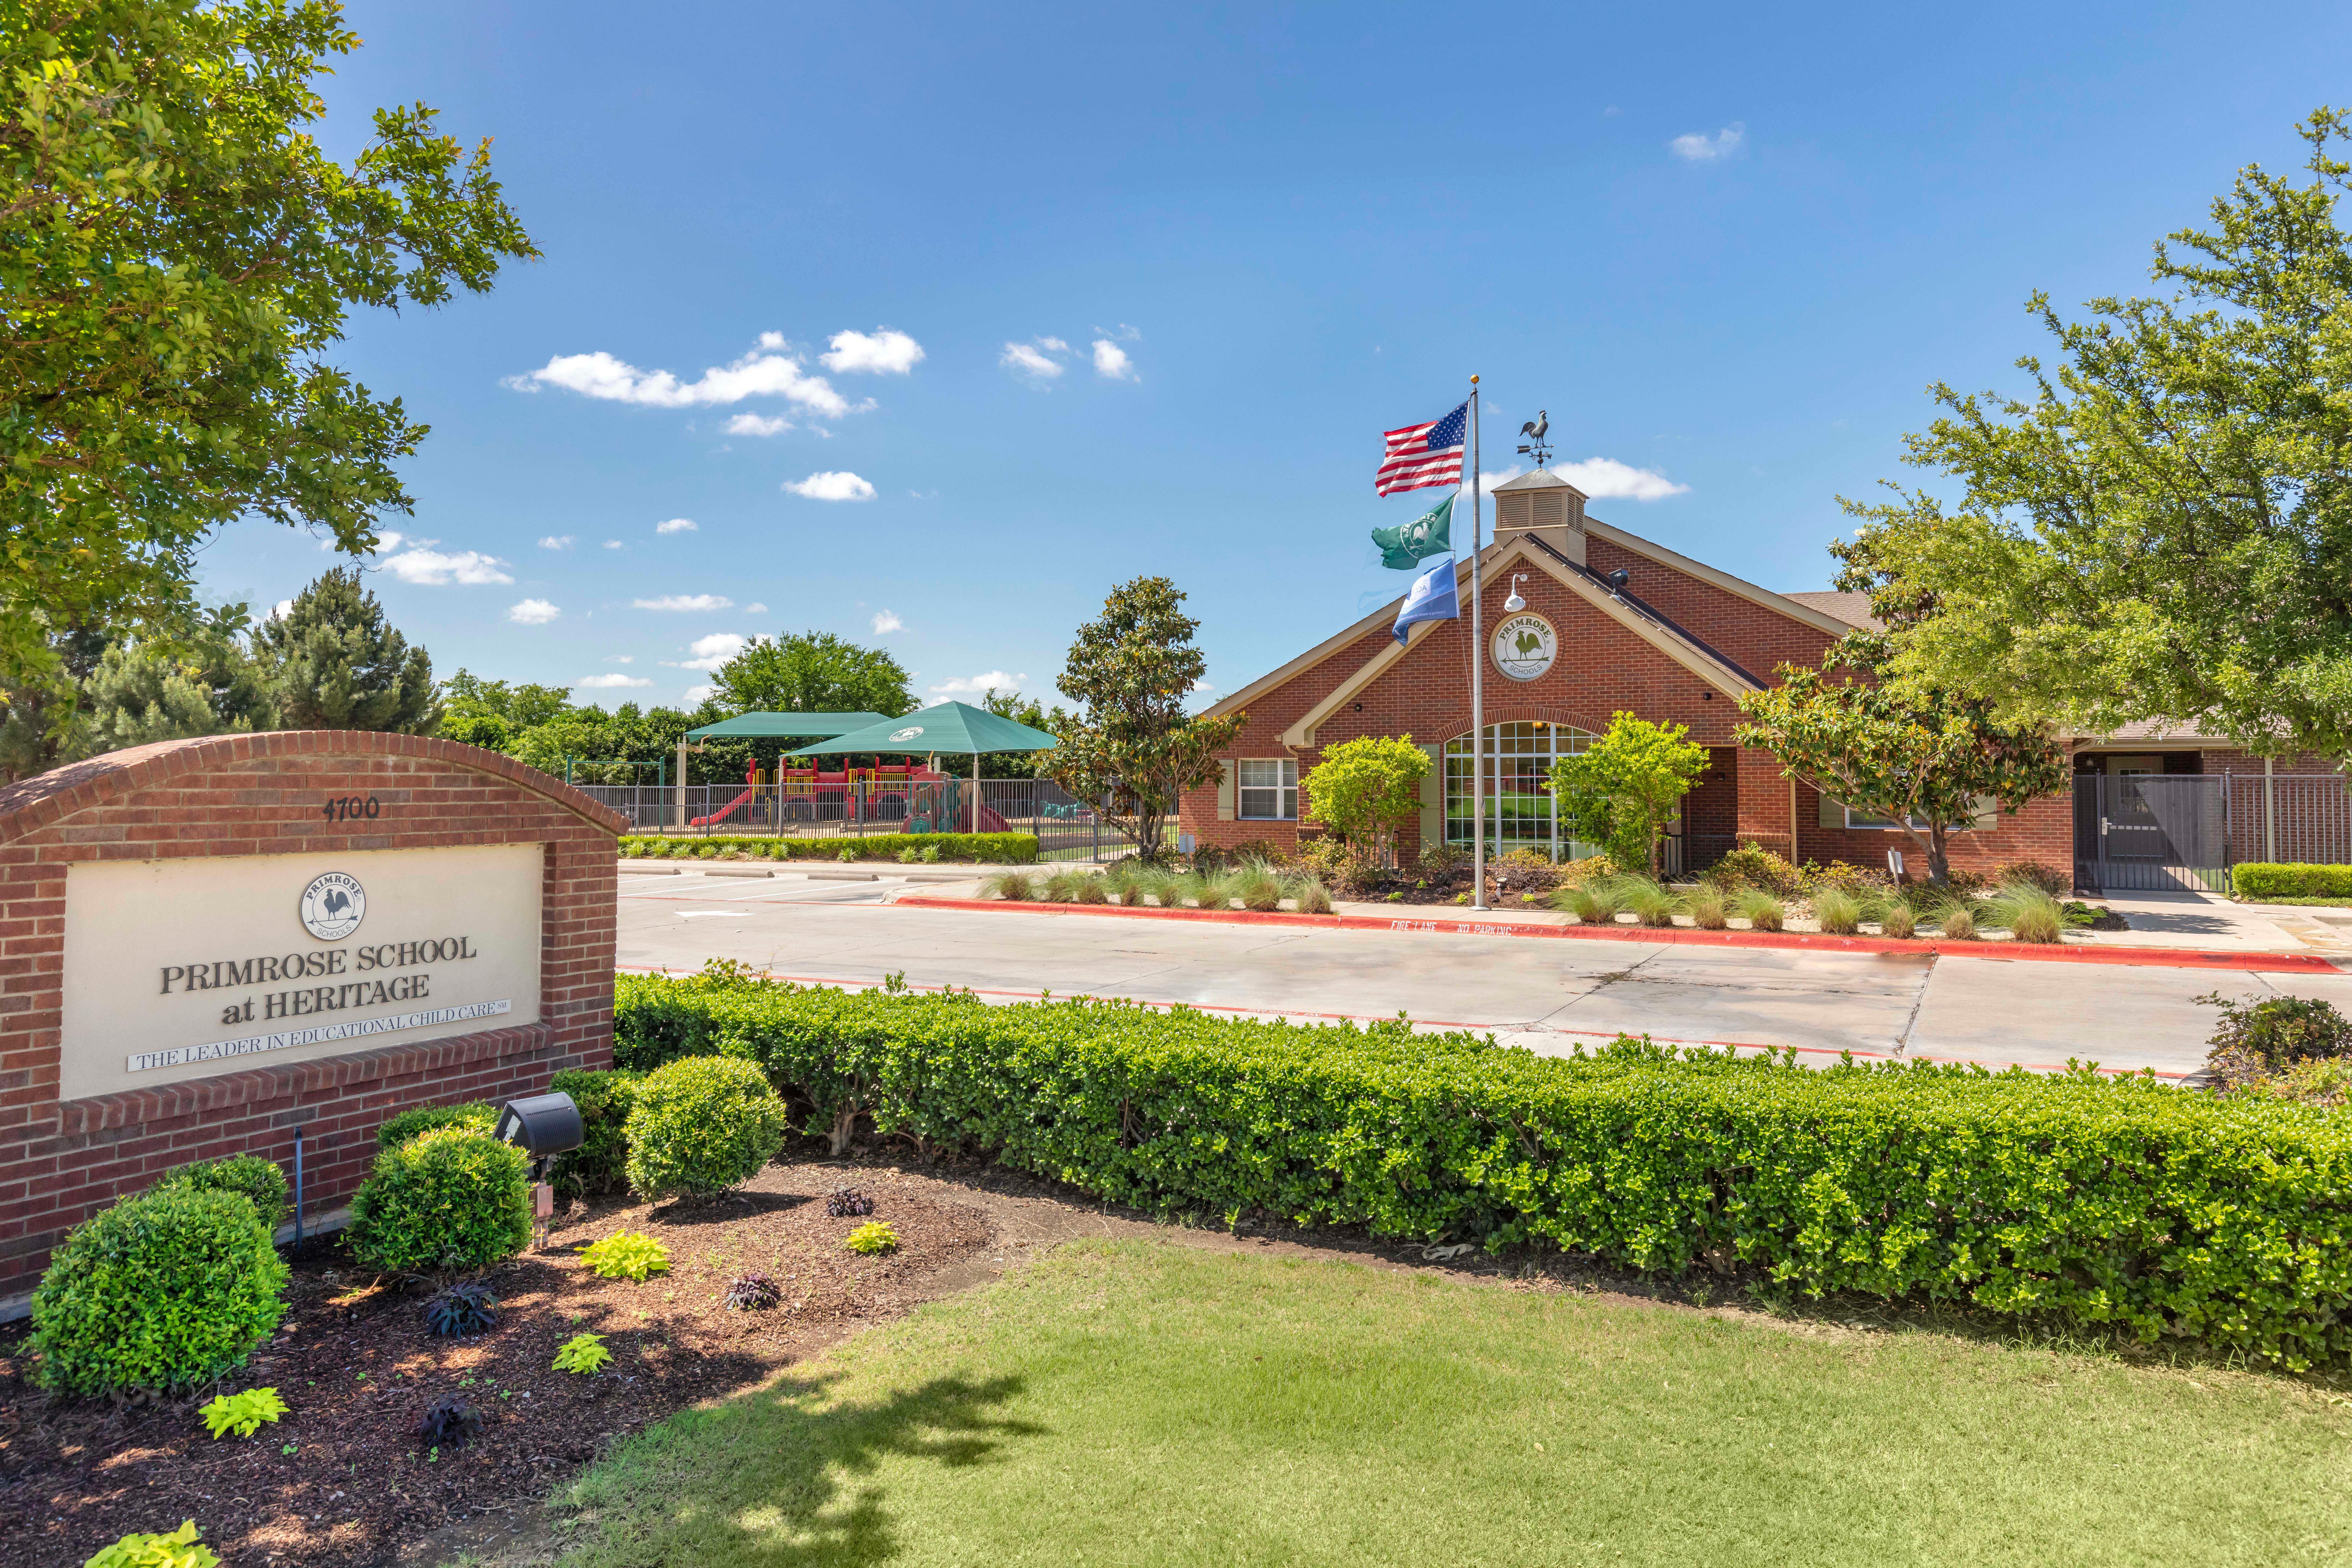 Primrose School at Heritage - Schools Keller Texas